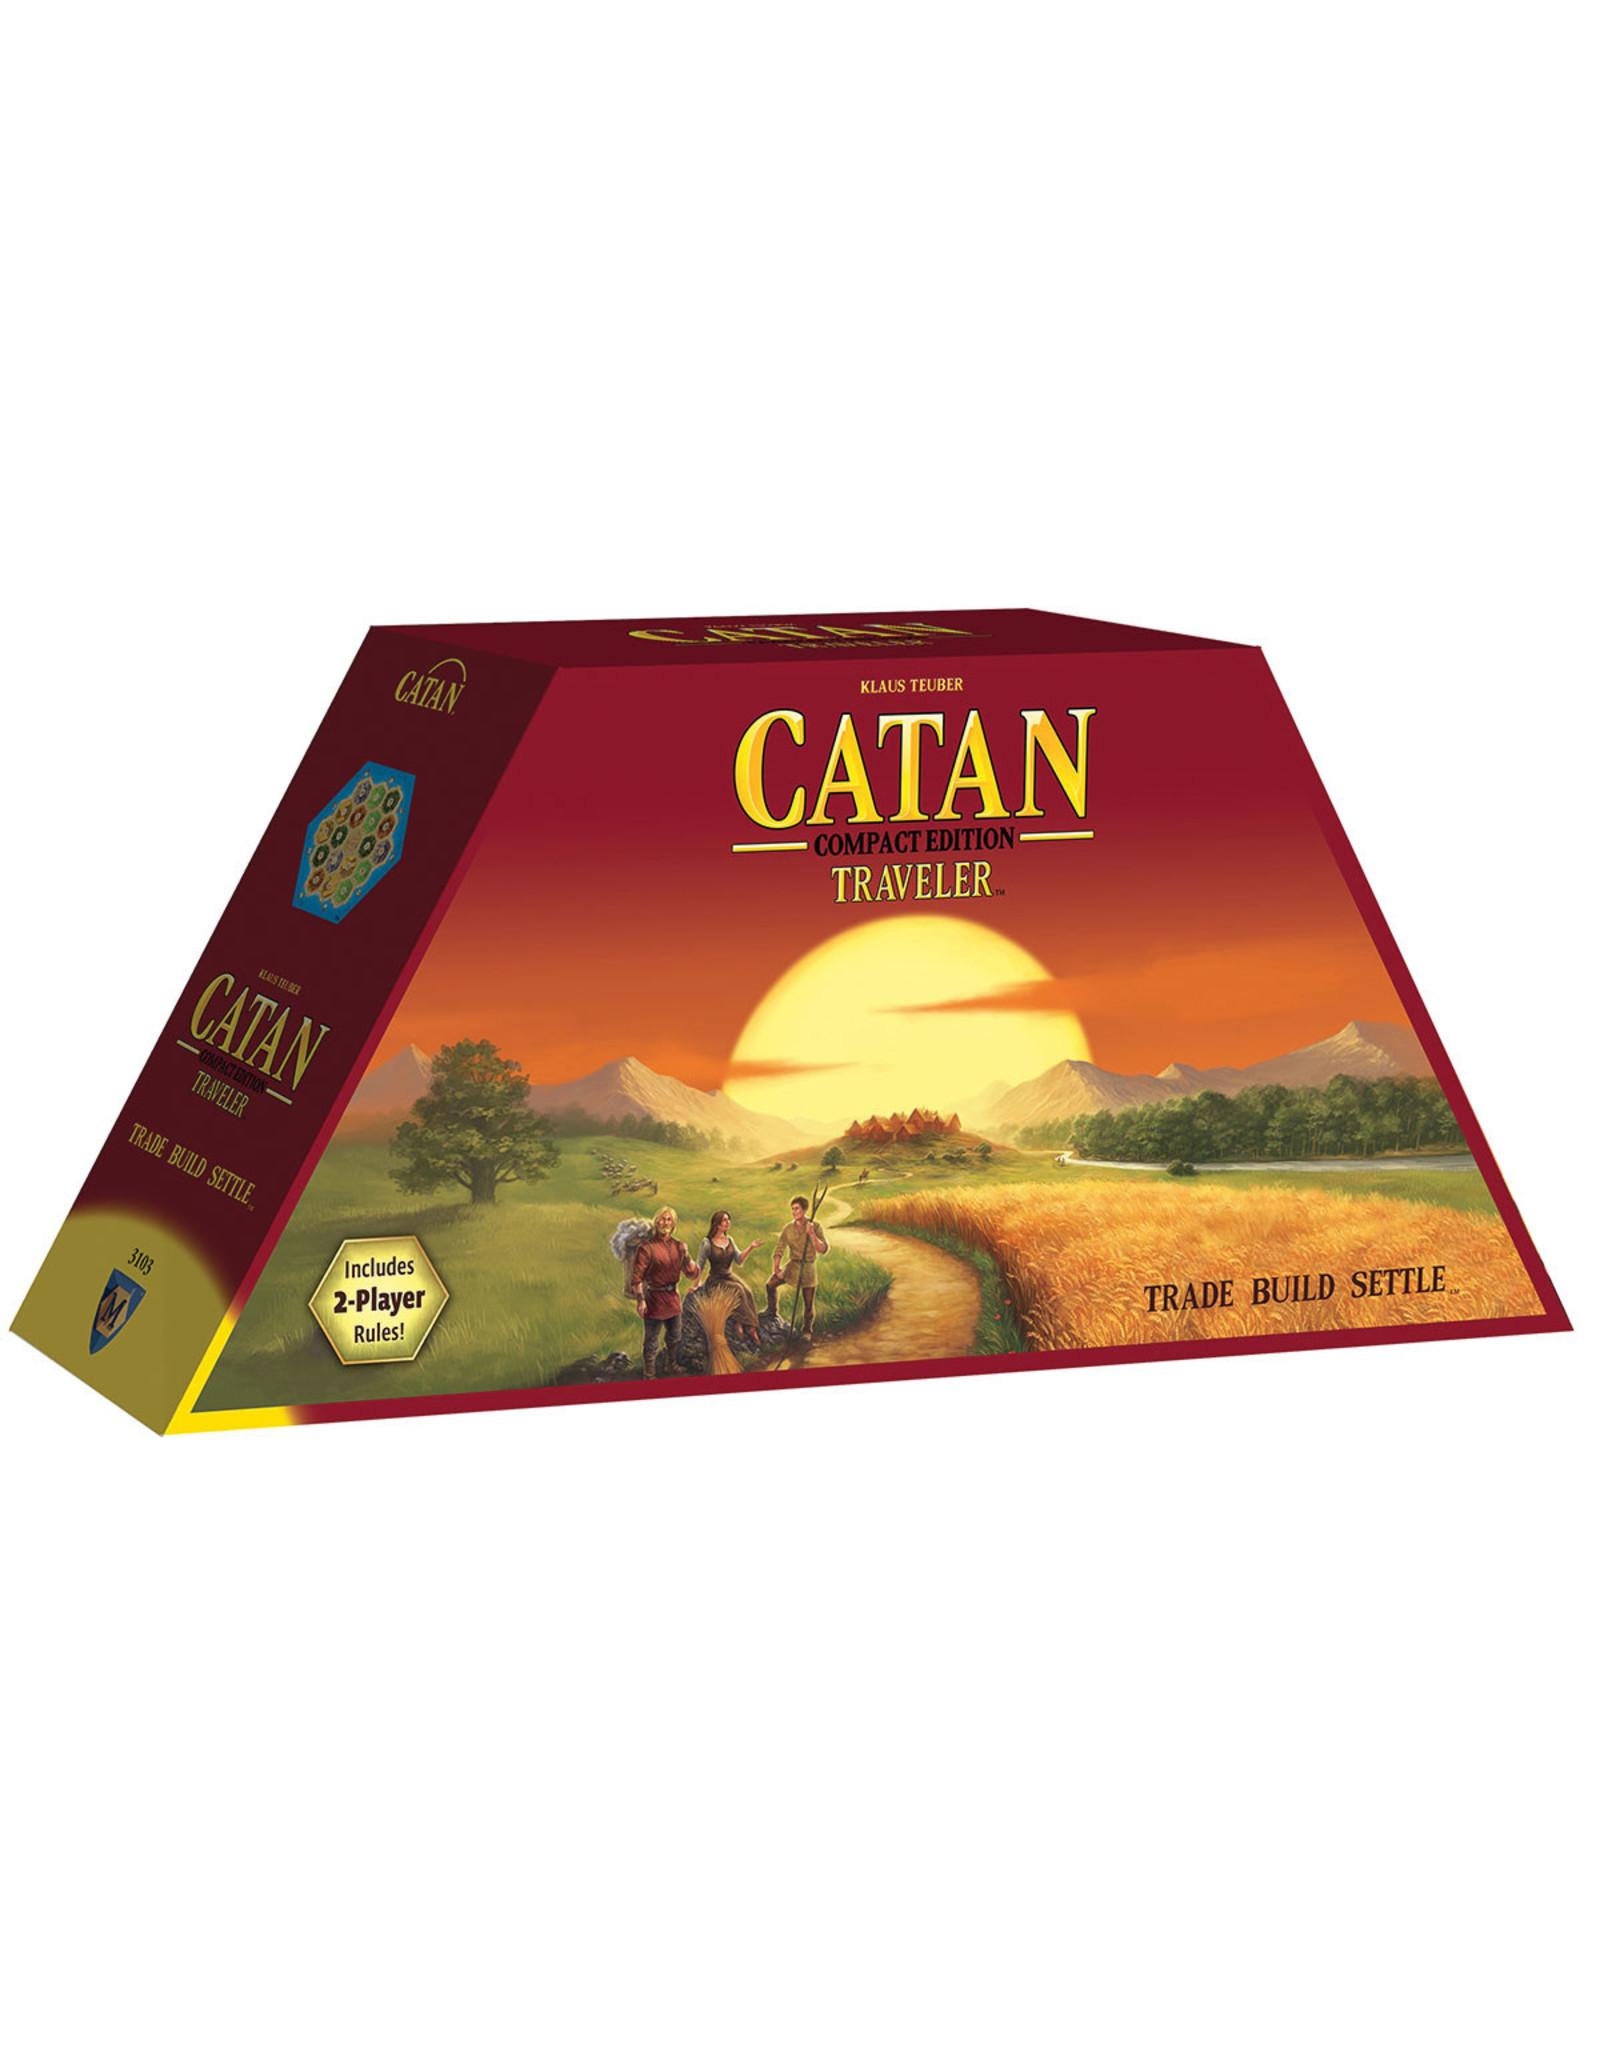 Catan Studio Catan Traveler Edition